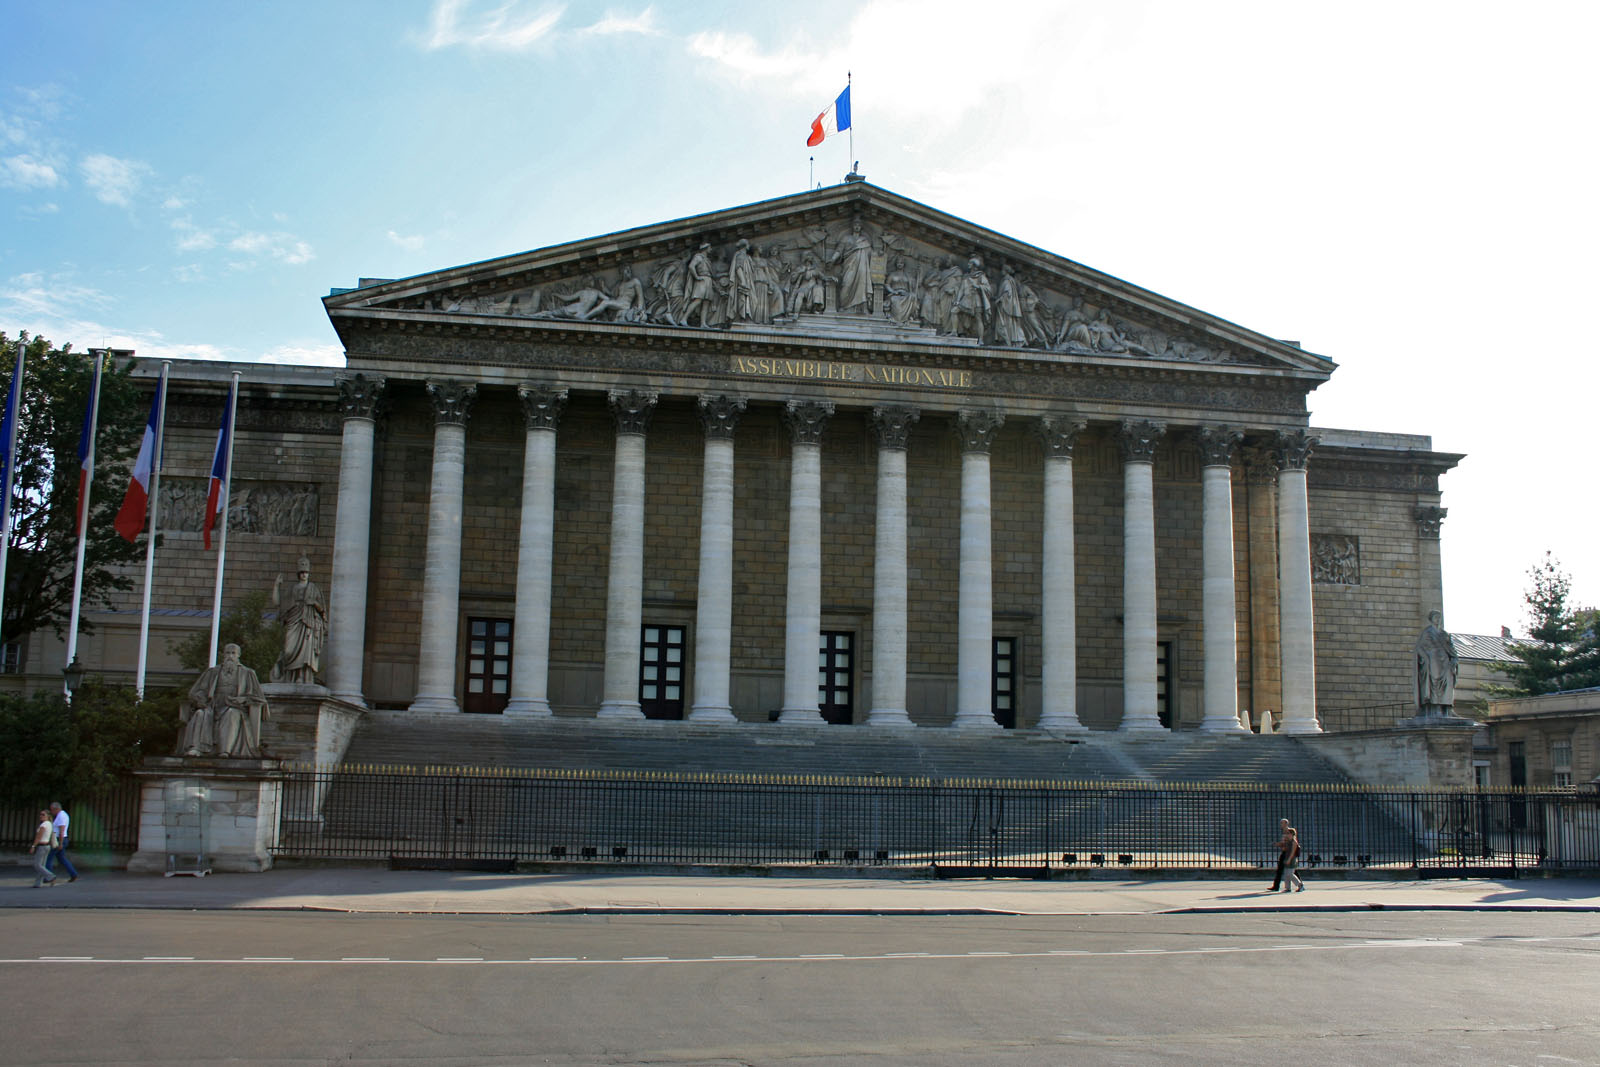 1600 assemblee nationale francaise 10